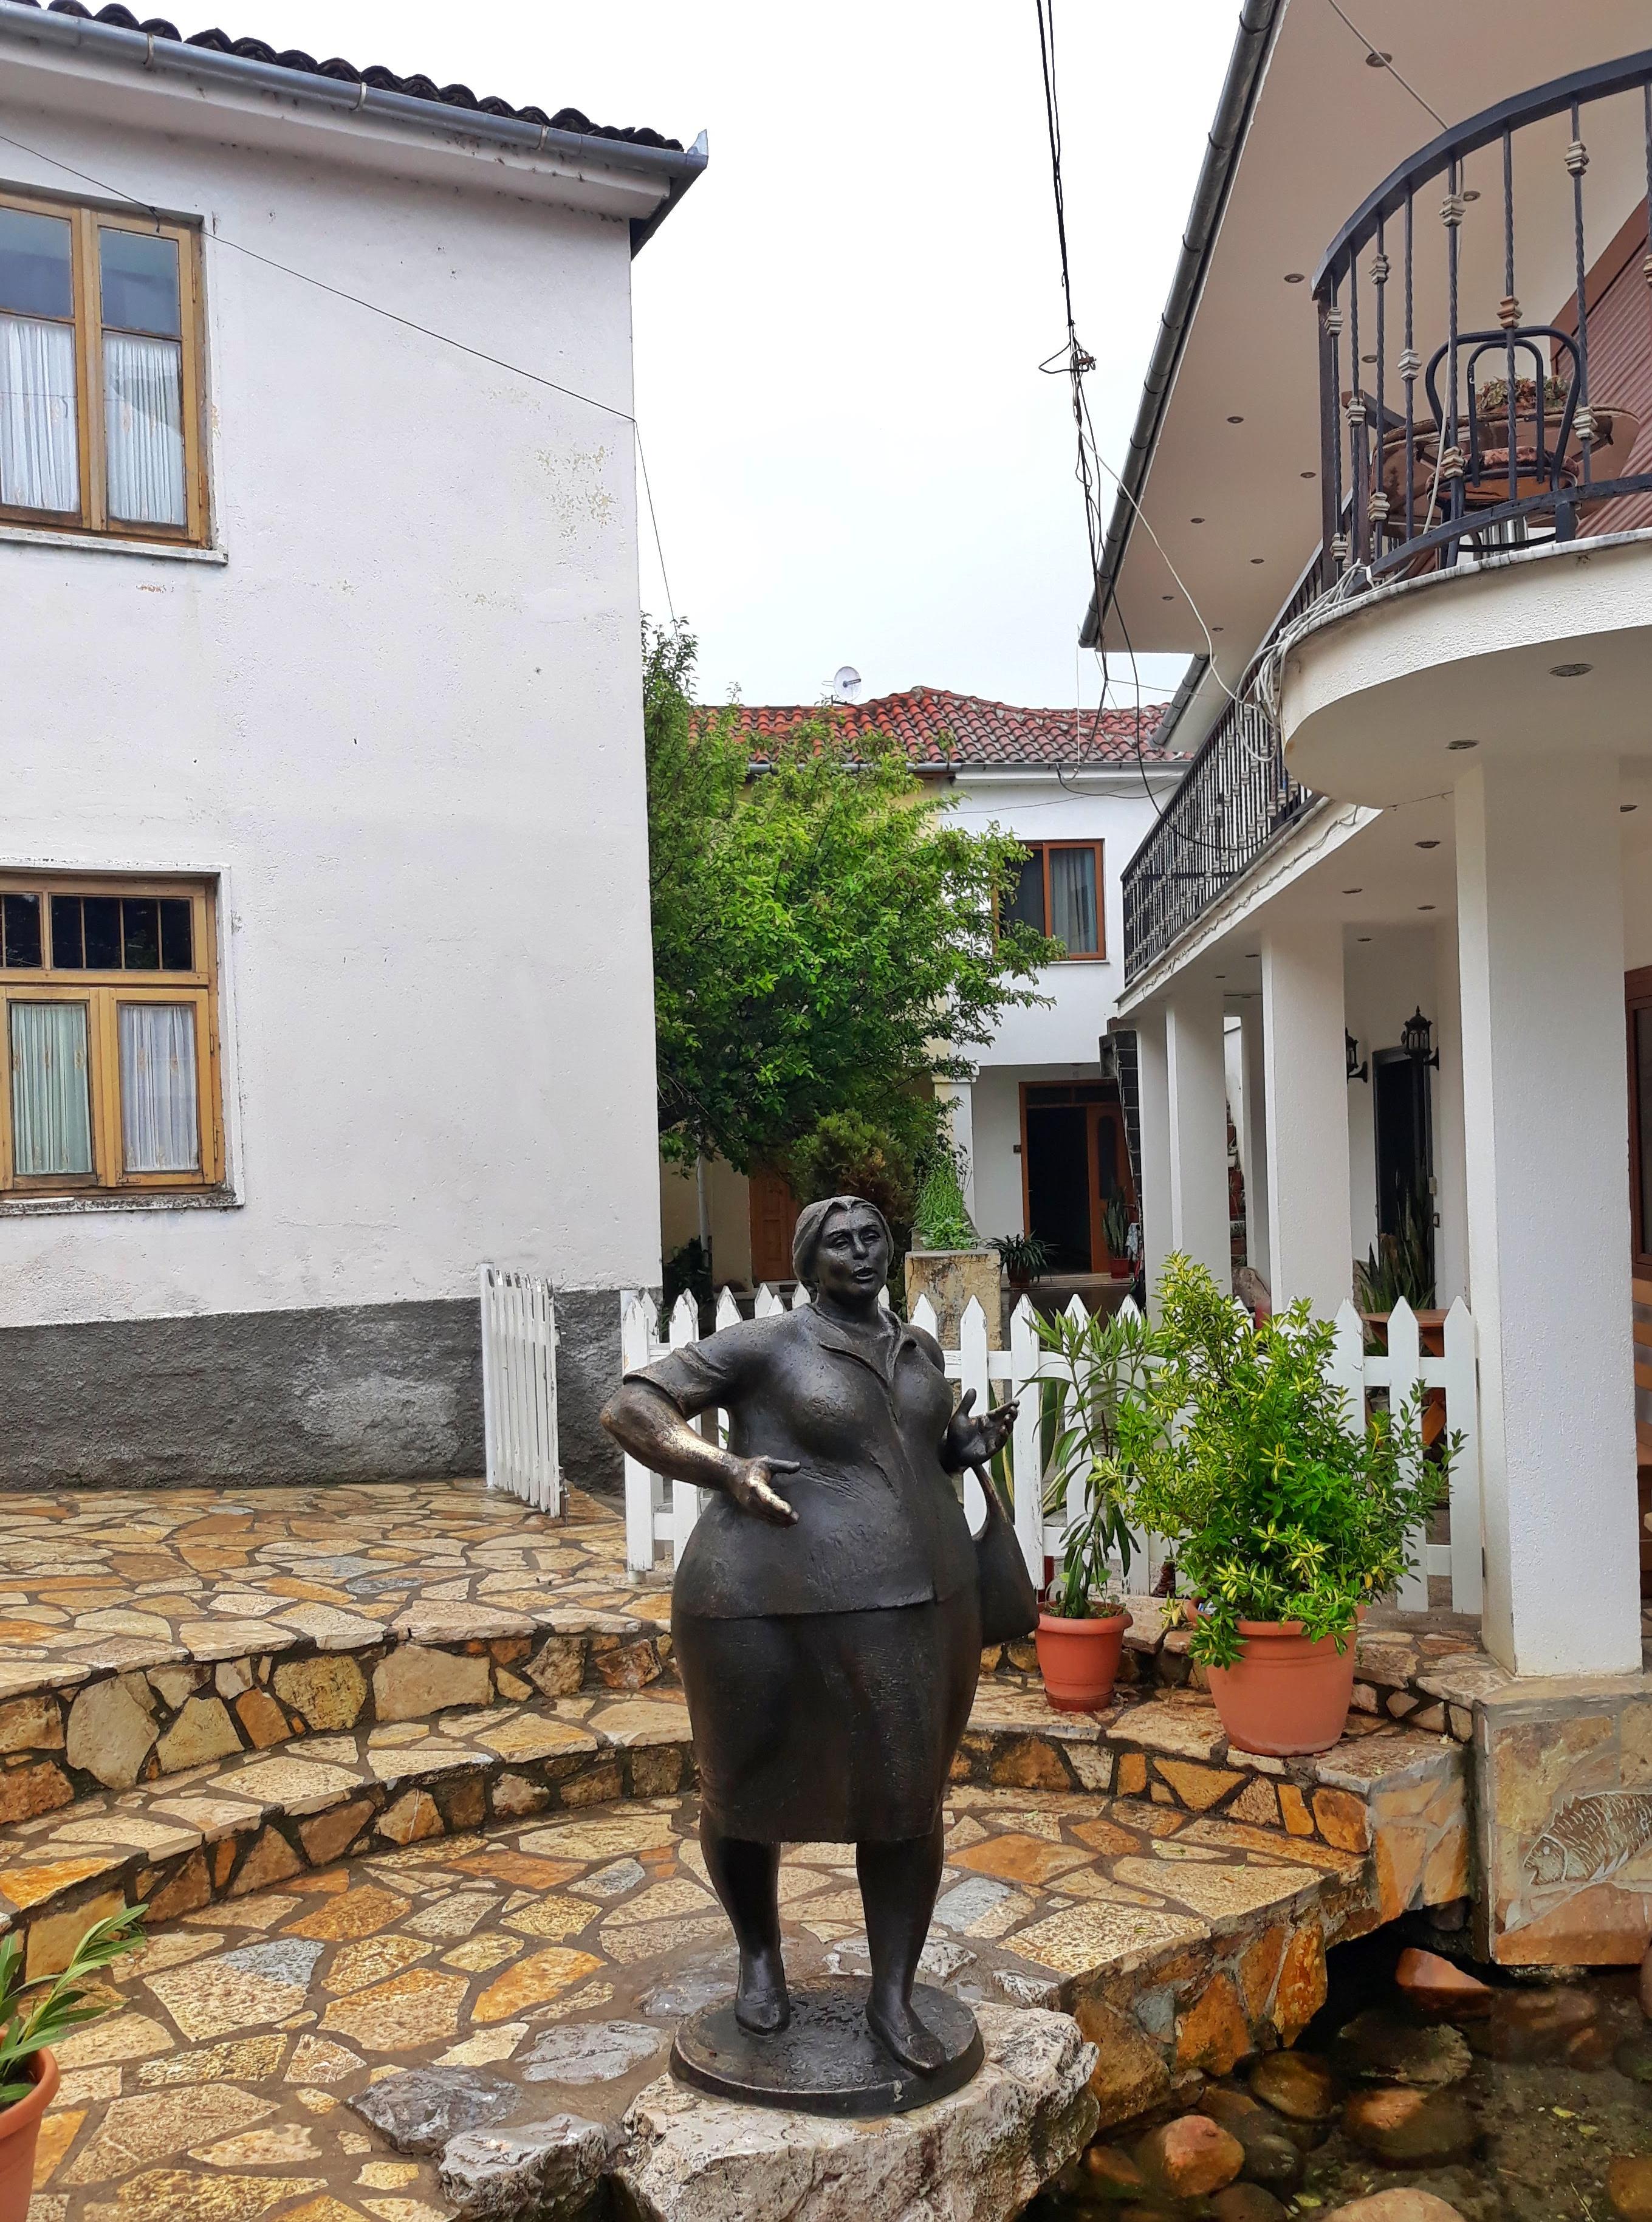 File:Statue,Ollga.jpg - Wikimedia Commons